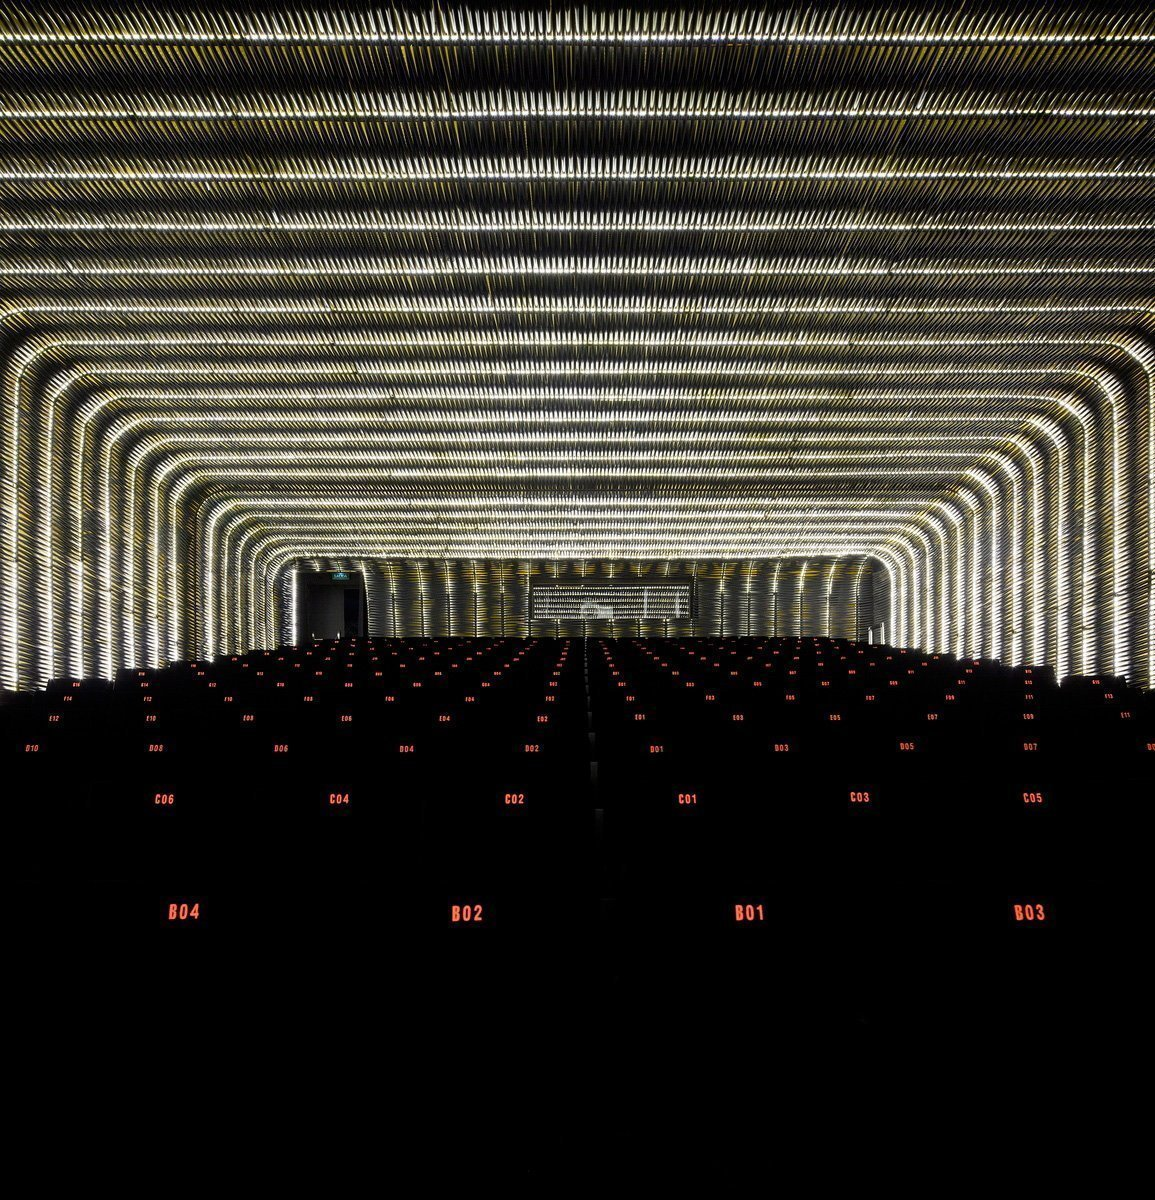 Cineteca-Matadero-Madrid-by-CHURTICHAGAQUADRA-SALCEDO